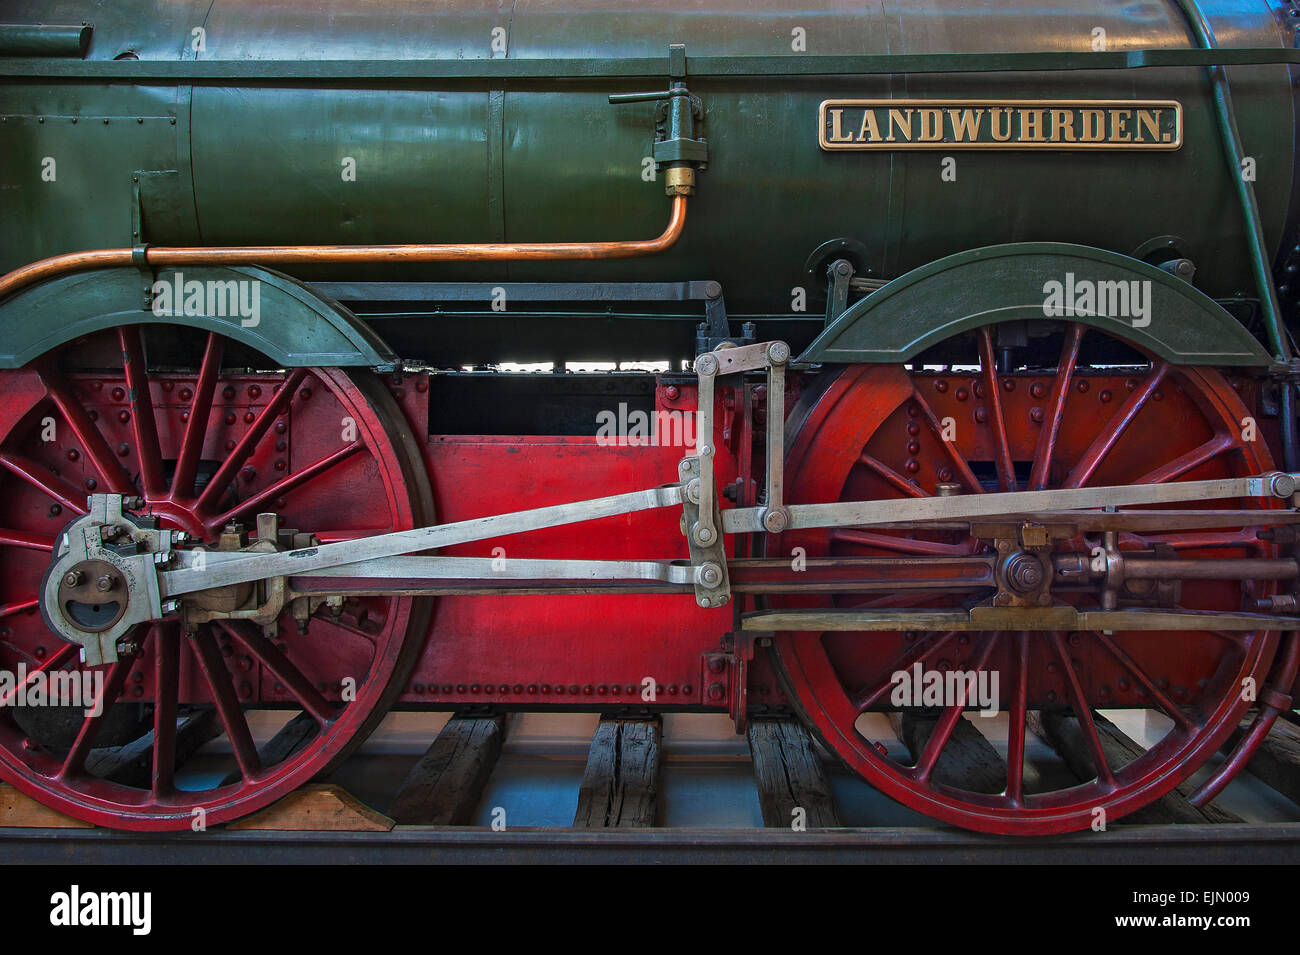 Wheels of the locomotive Landwührden by Krauss & Companie, 1867, Germany - Stock Image